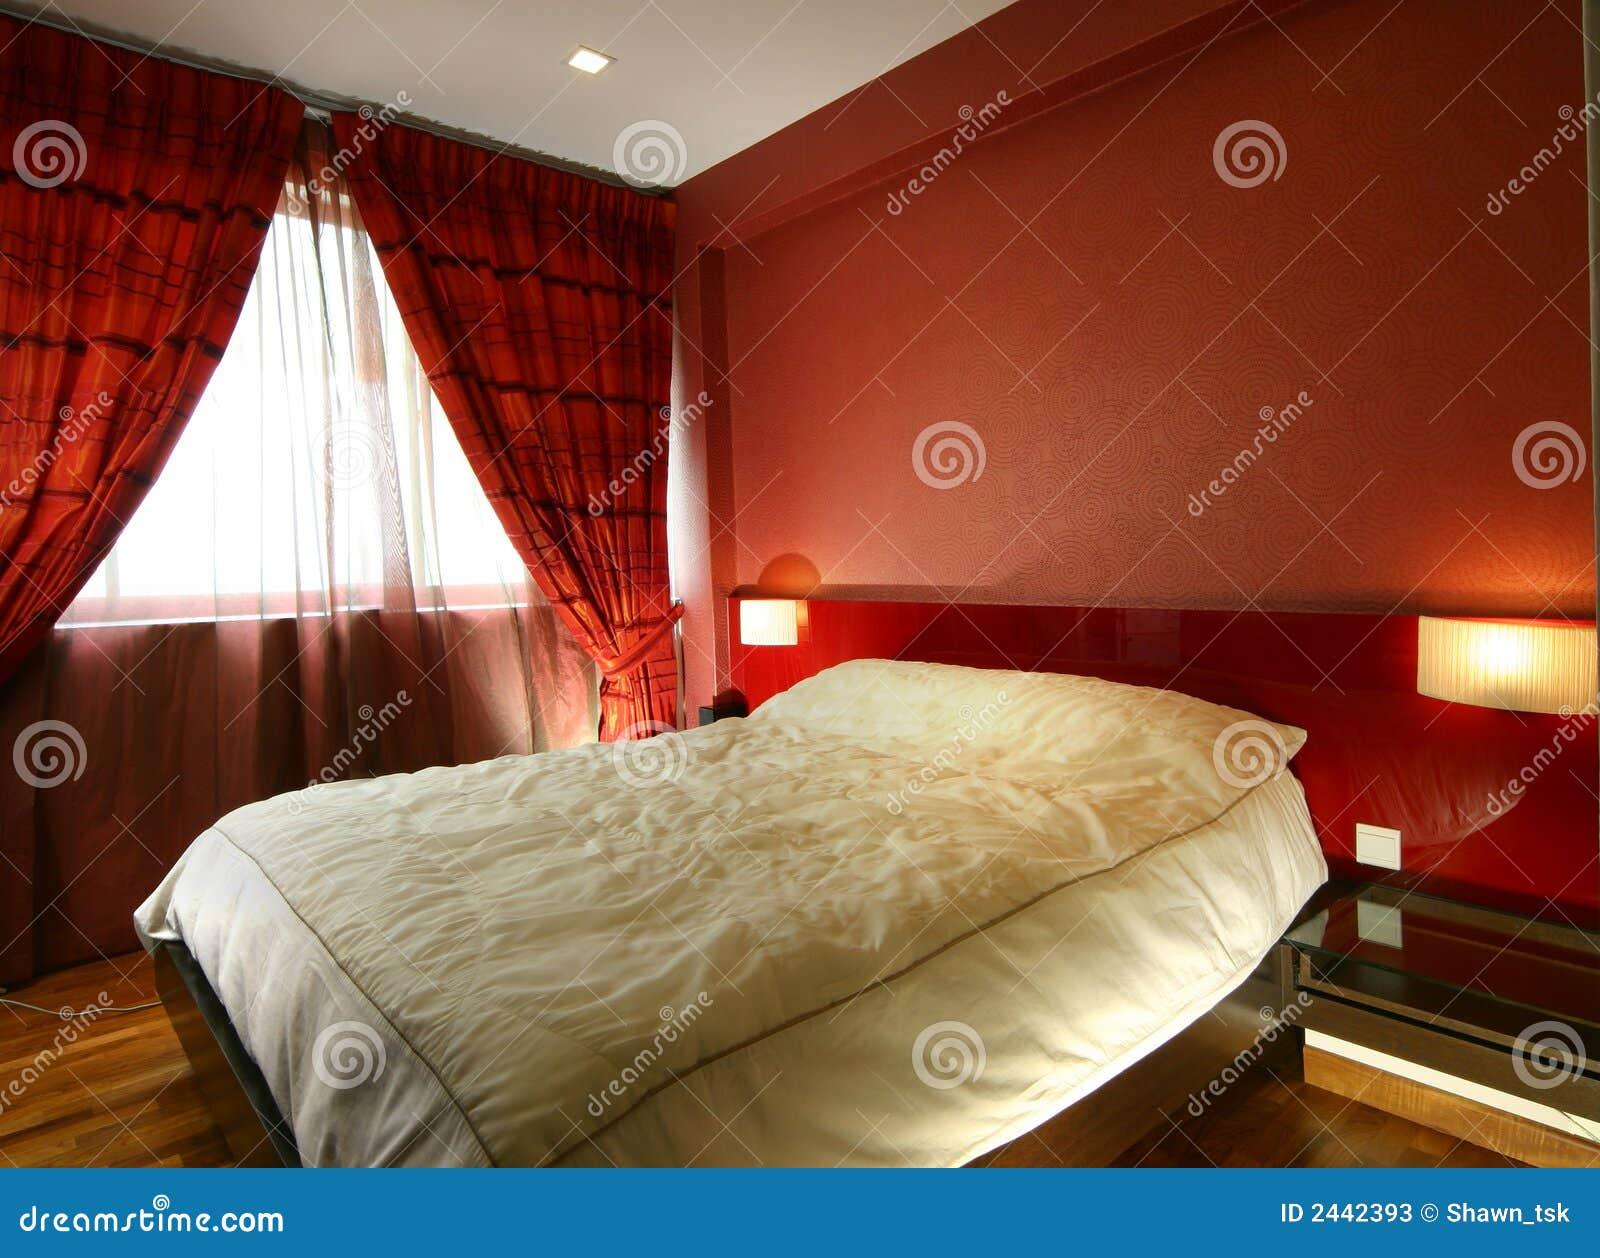 Interior Designer Camera Da Letto.Interior Design Bedroom Stock Image Image Of Light 2442393